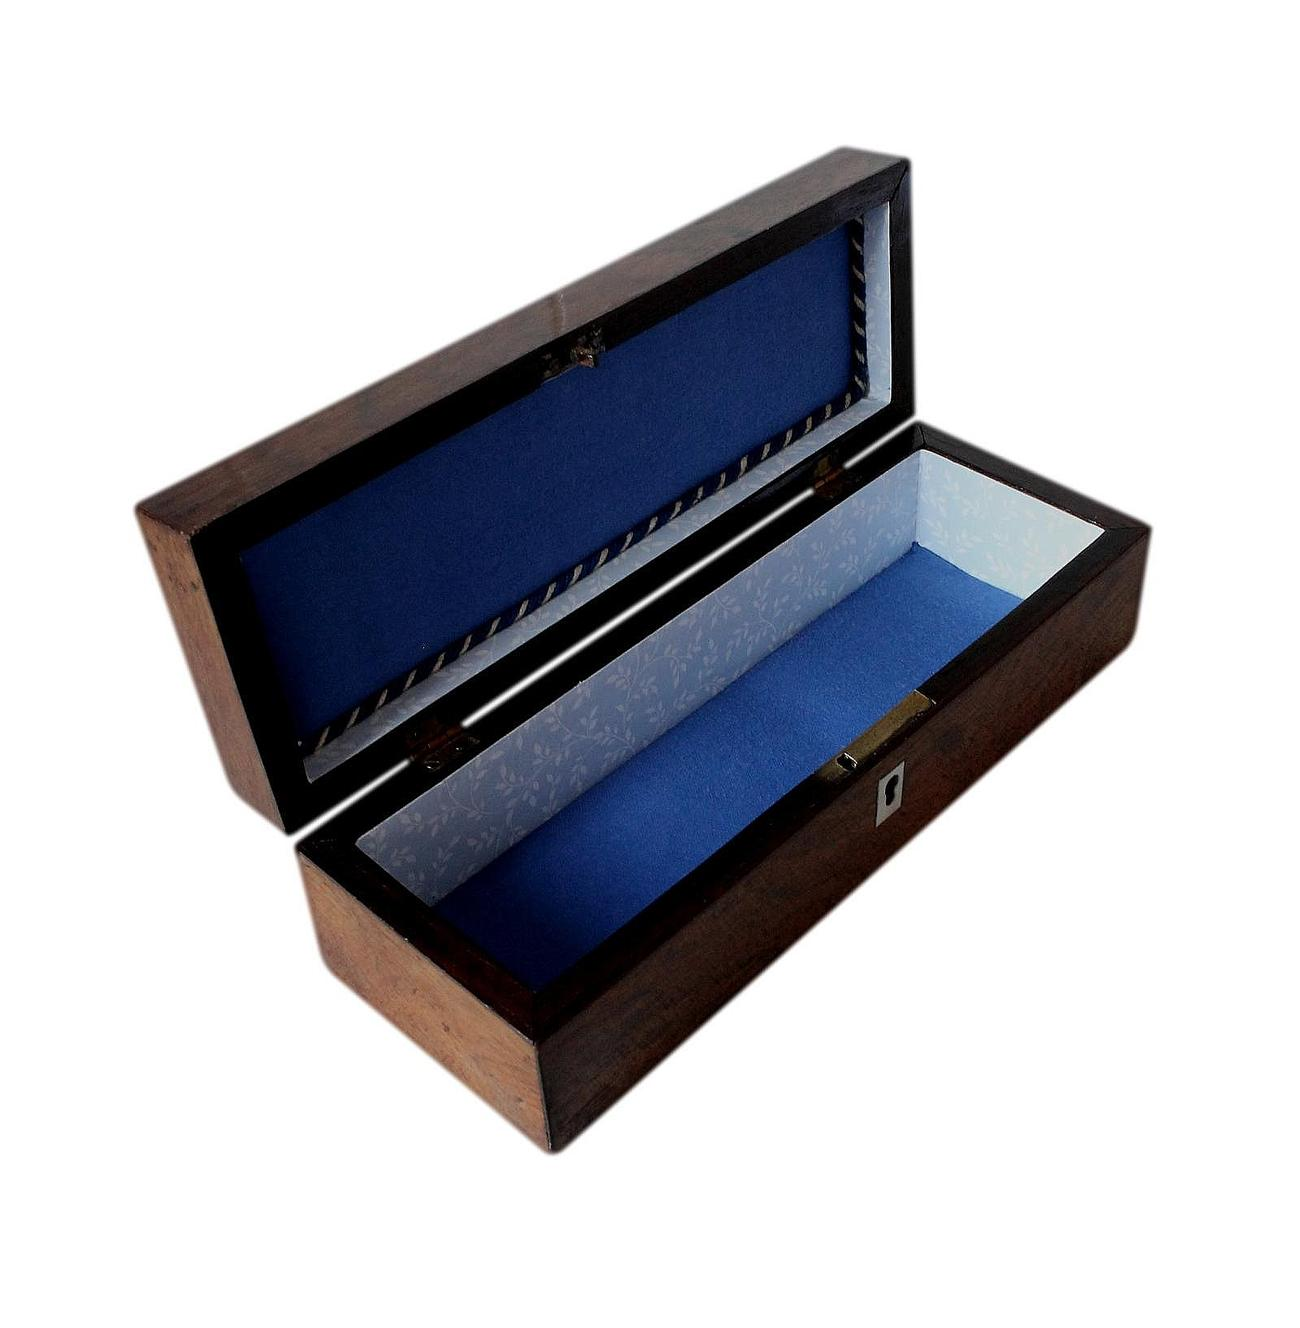 Small_antique_Rosewood_glove_jewellery_box_3.jpg